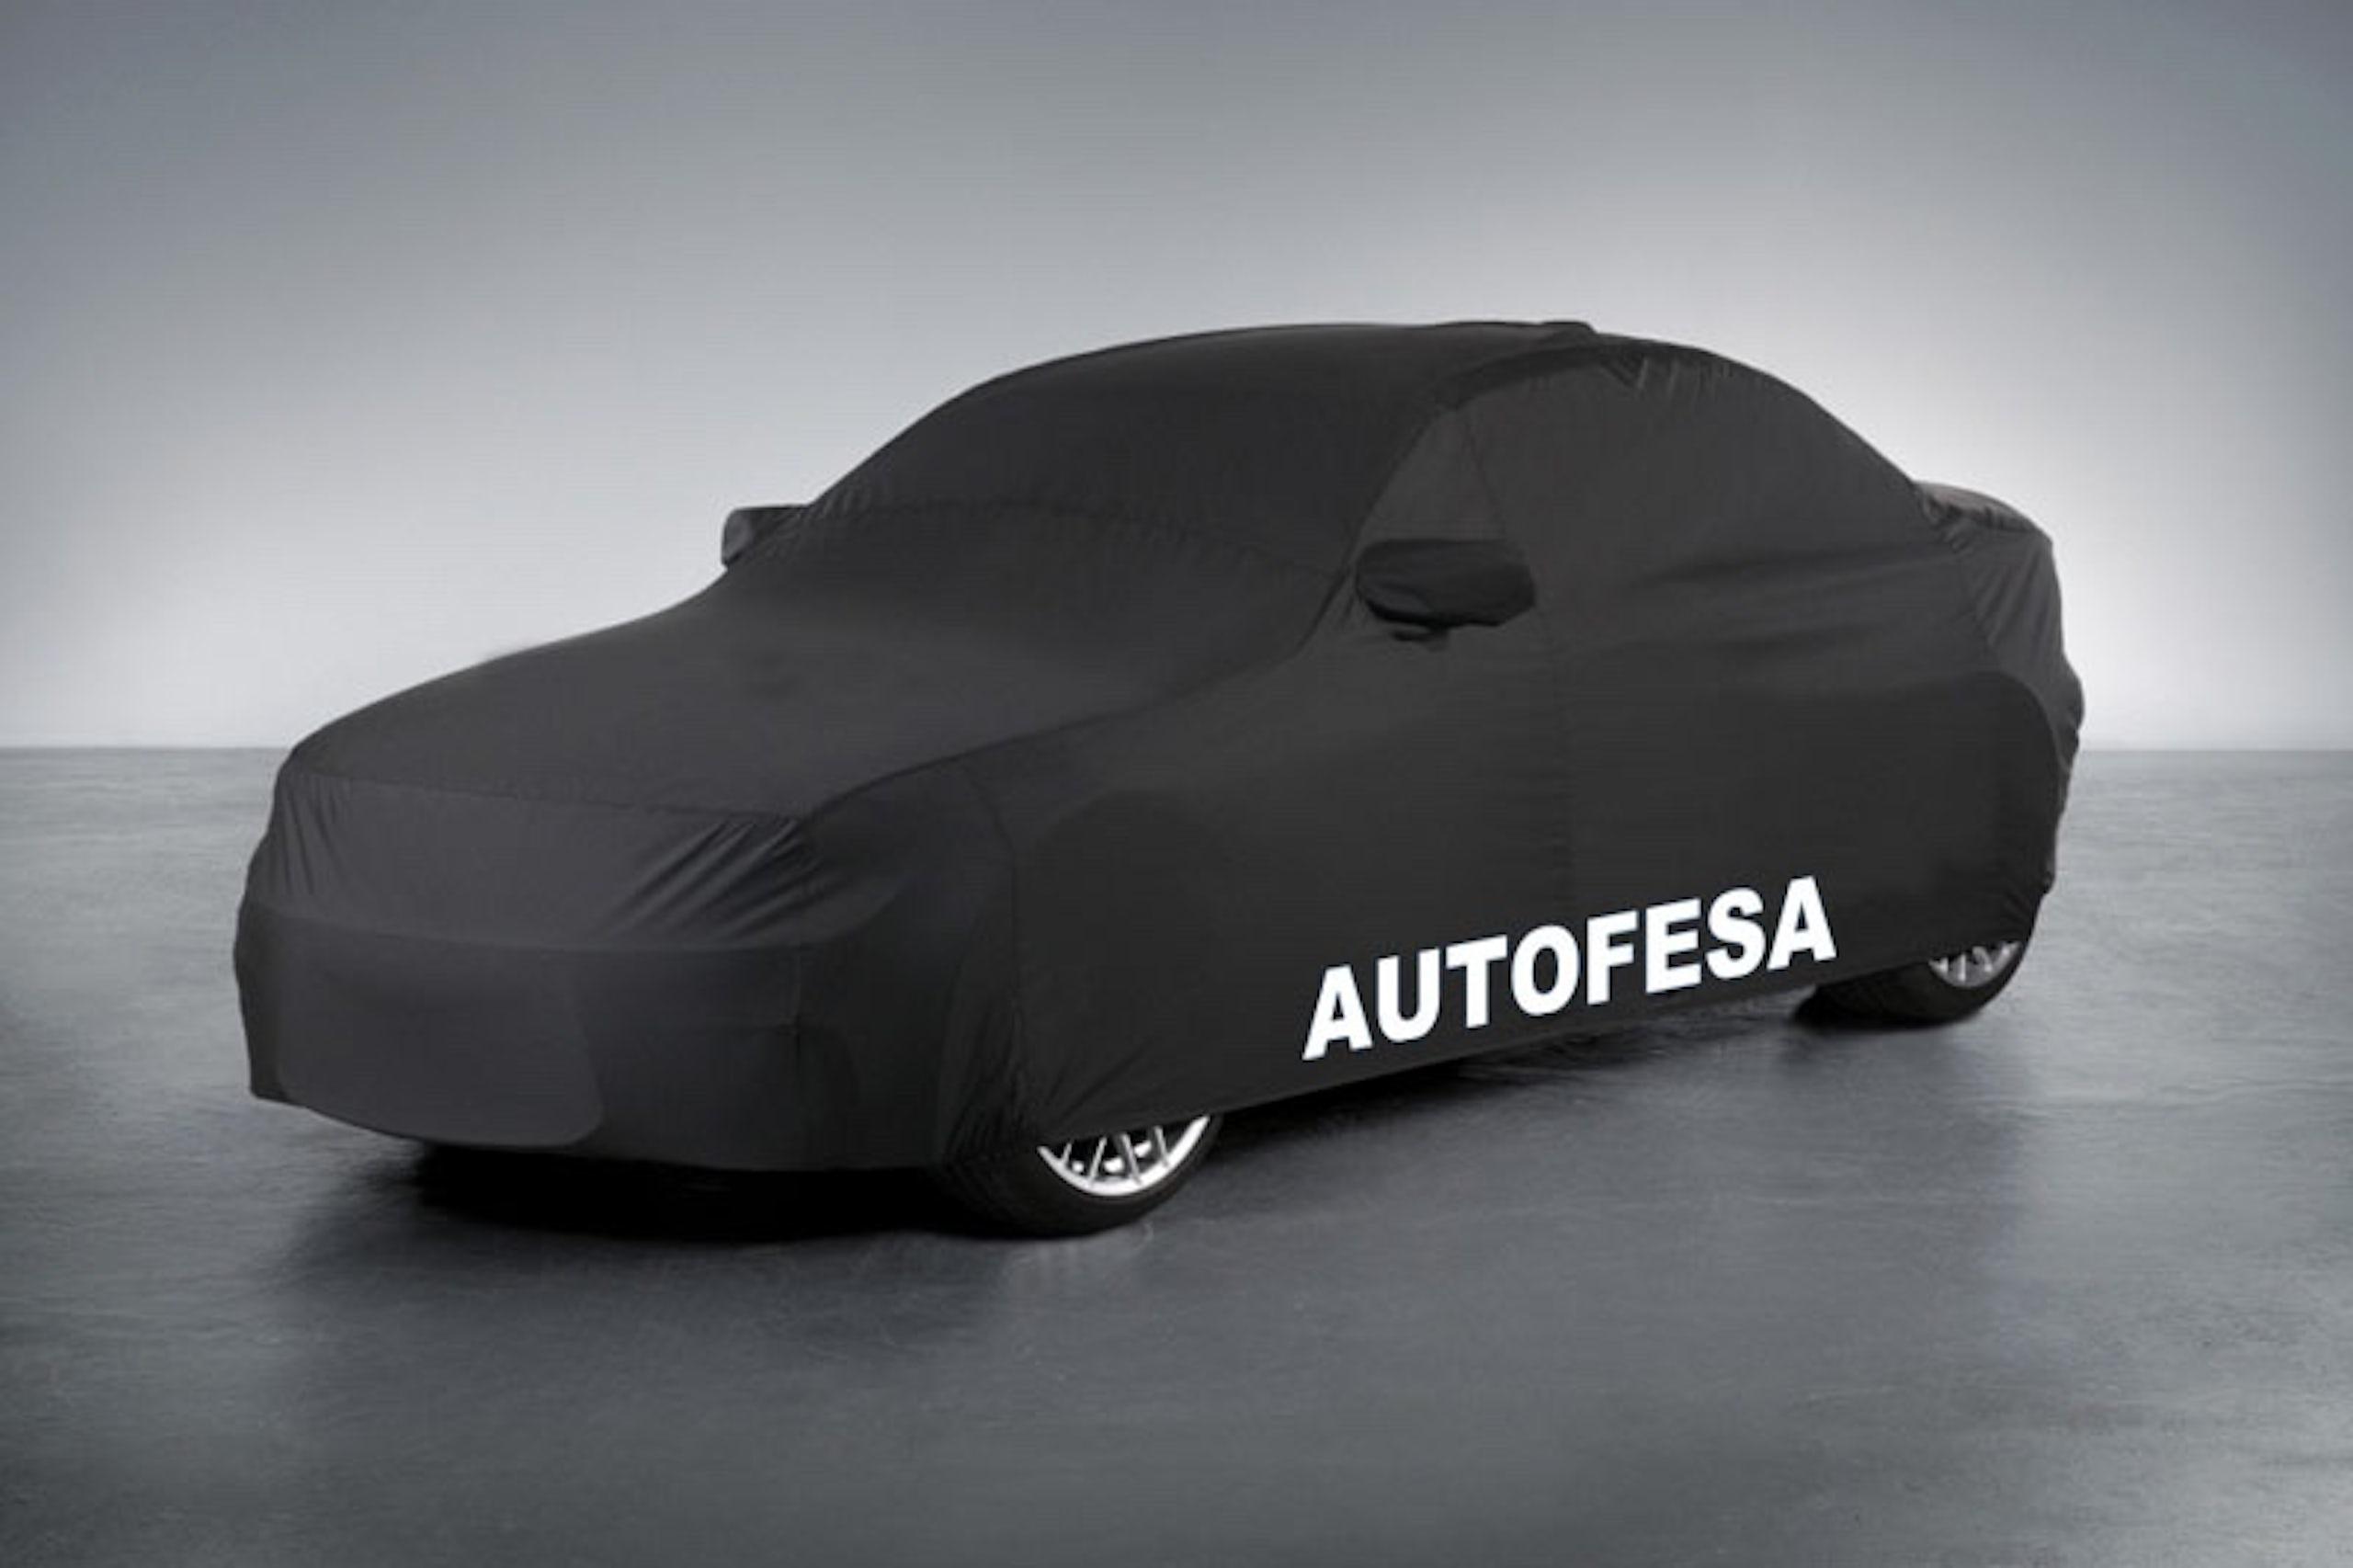 Audi A6 A6Avant COMPETITION ABT 3.0 TDI V6 T 326cv quattro 5p S tronic 4x4 Cpmpetition ABT S/S - Foto 34